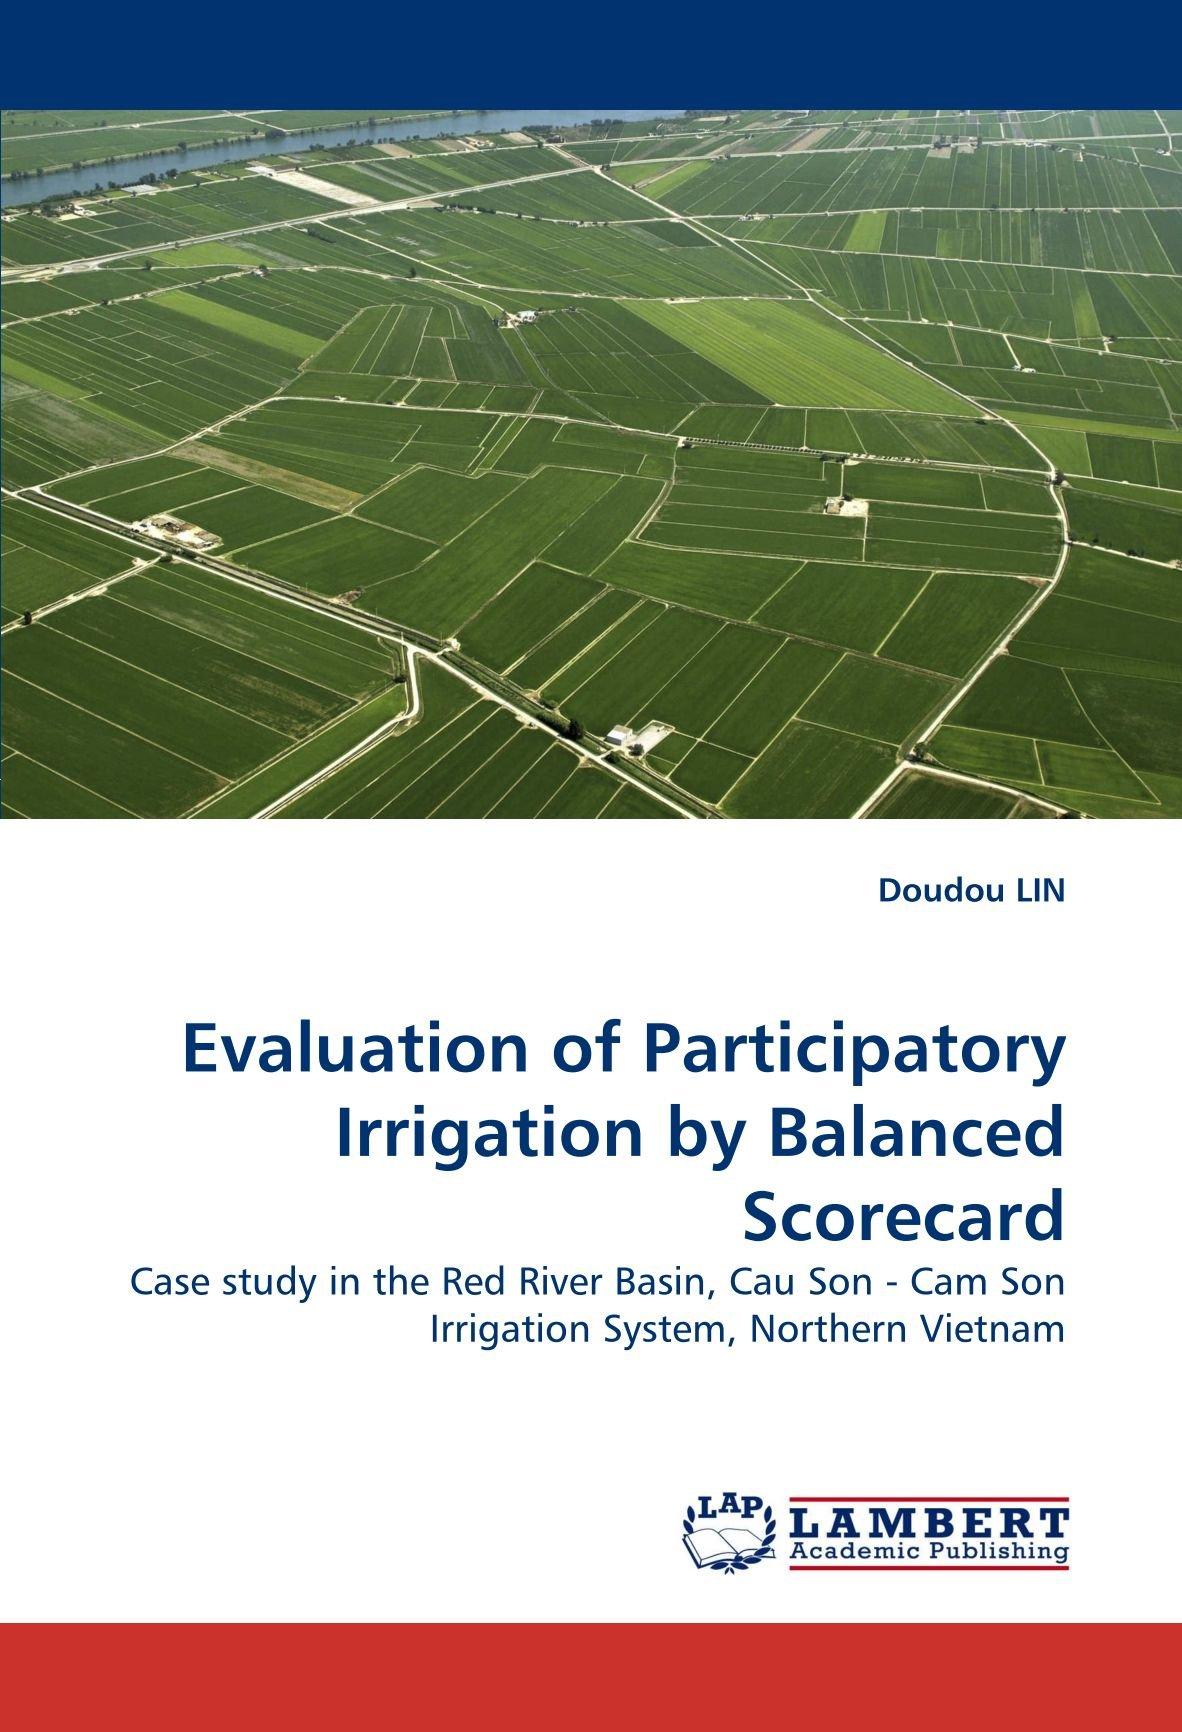 Evaluation of Participatory Irrigation by Balanced Scorecard: Case study in the Red River Basin, Cau Son - Cam Son Irrigation System, Northern Vietnam pdf epub